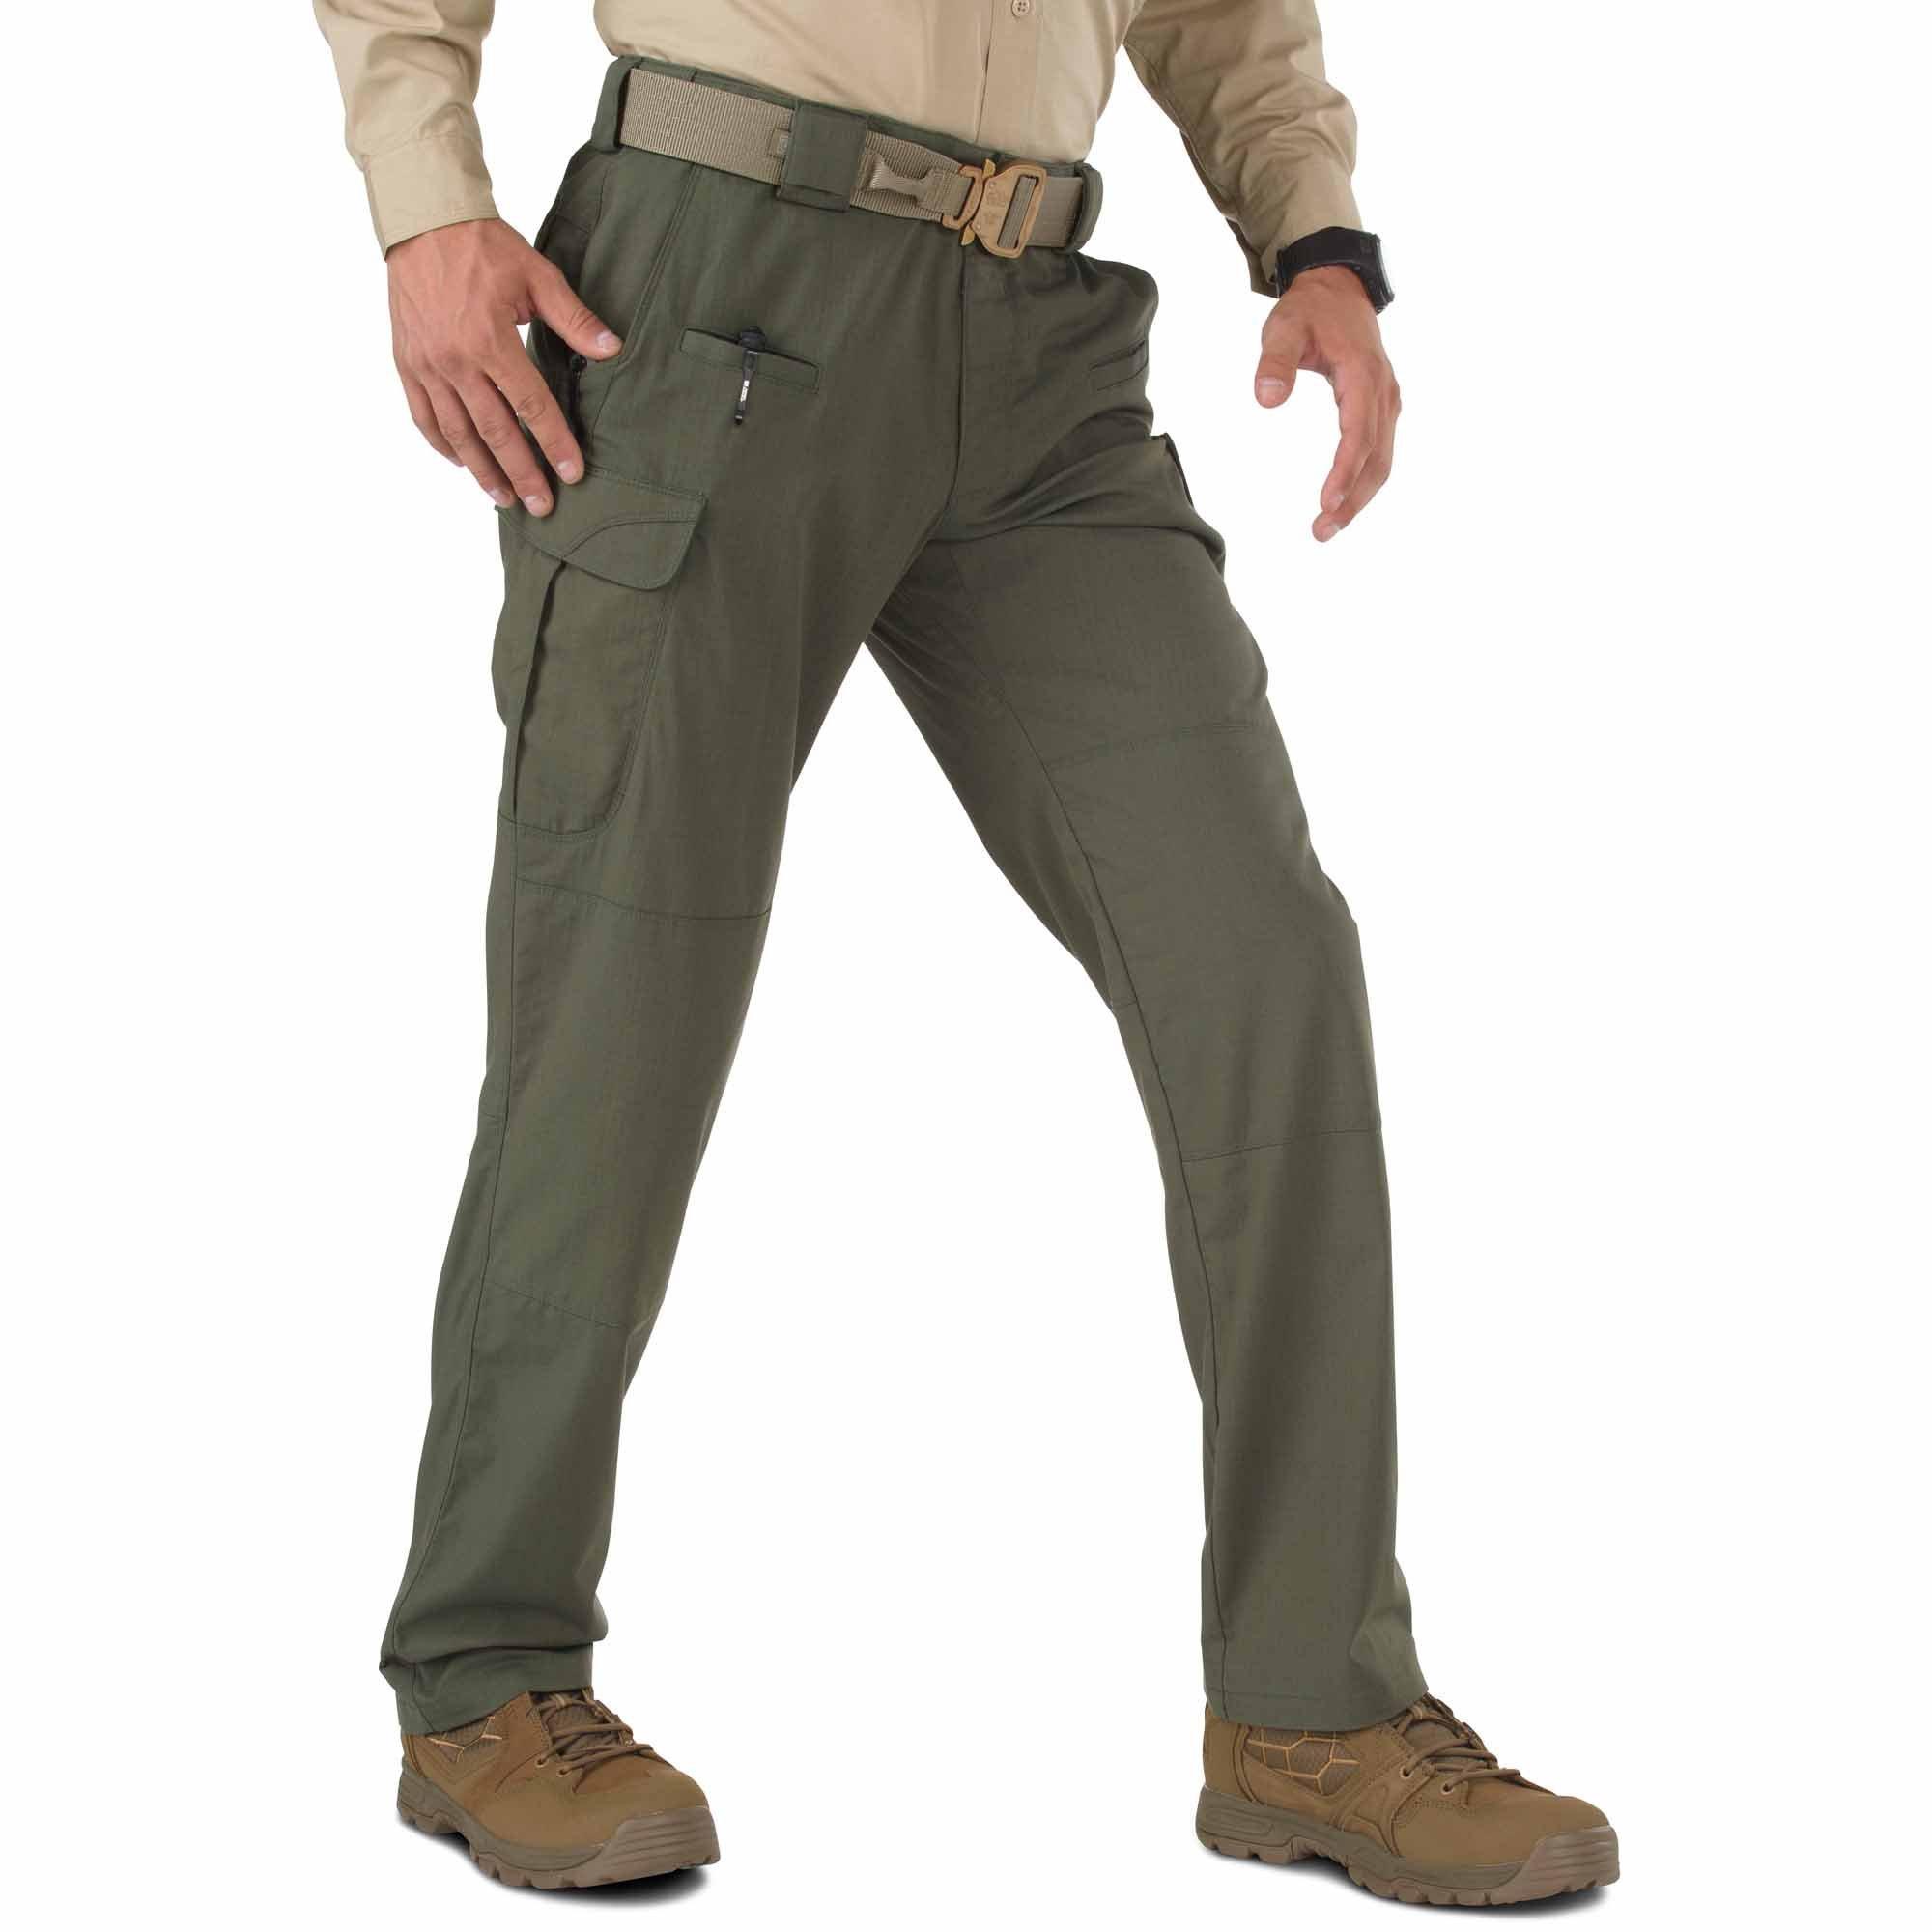 5.11 Tactical Stryke Pant, Tdu Green, 32x34